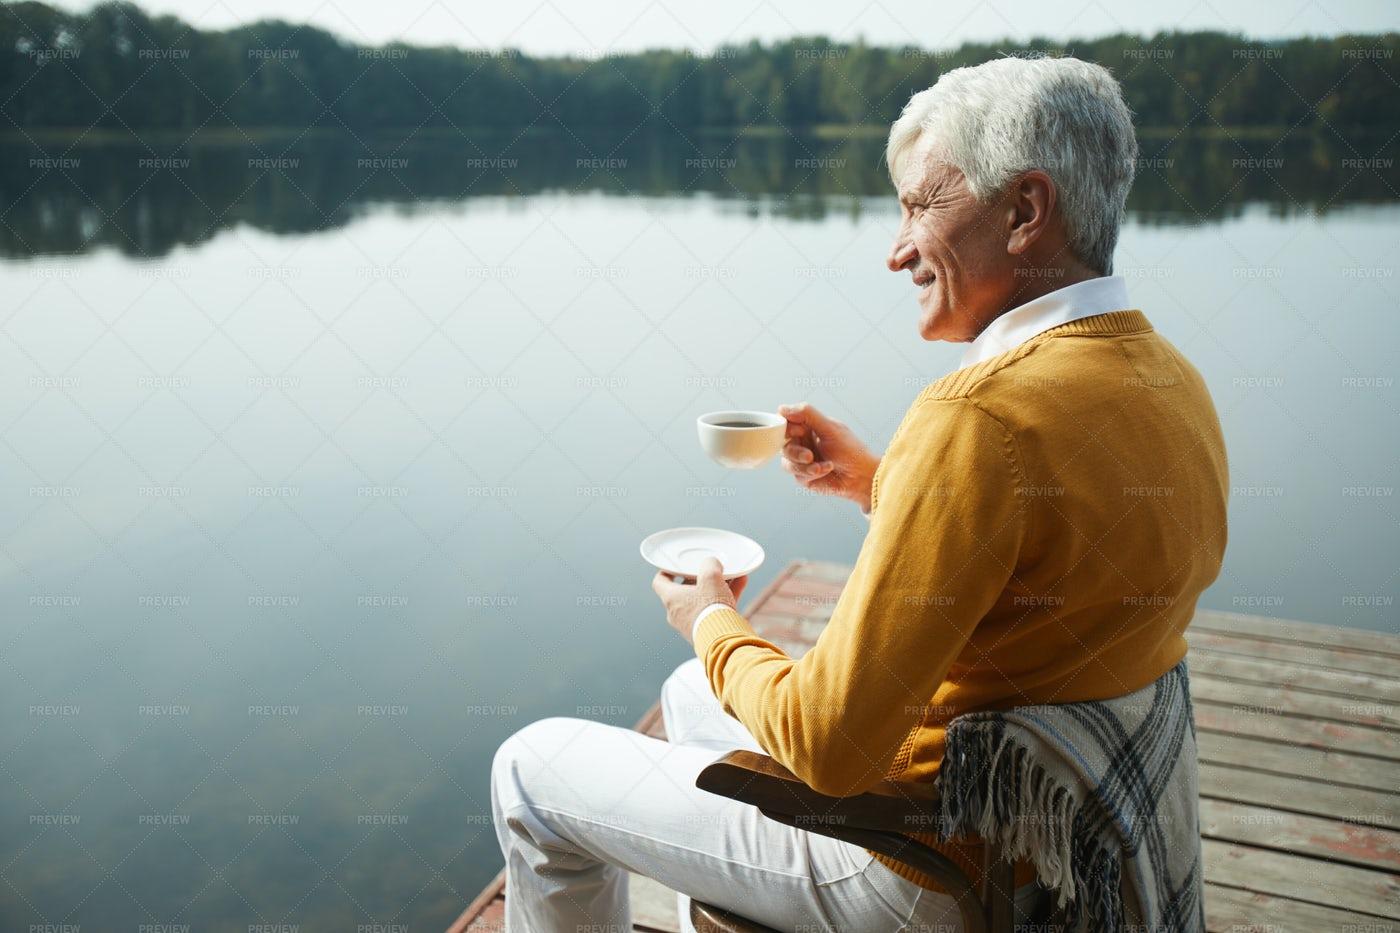 Drinking Coffee On Pier: Stock Photos